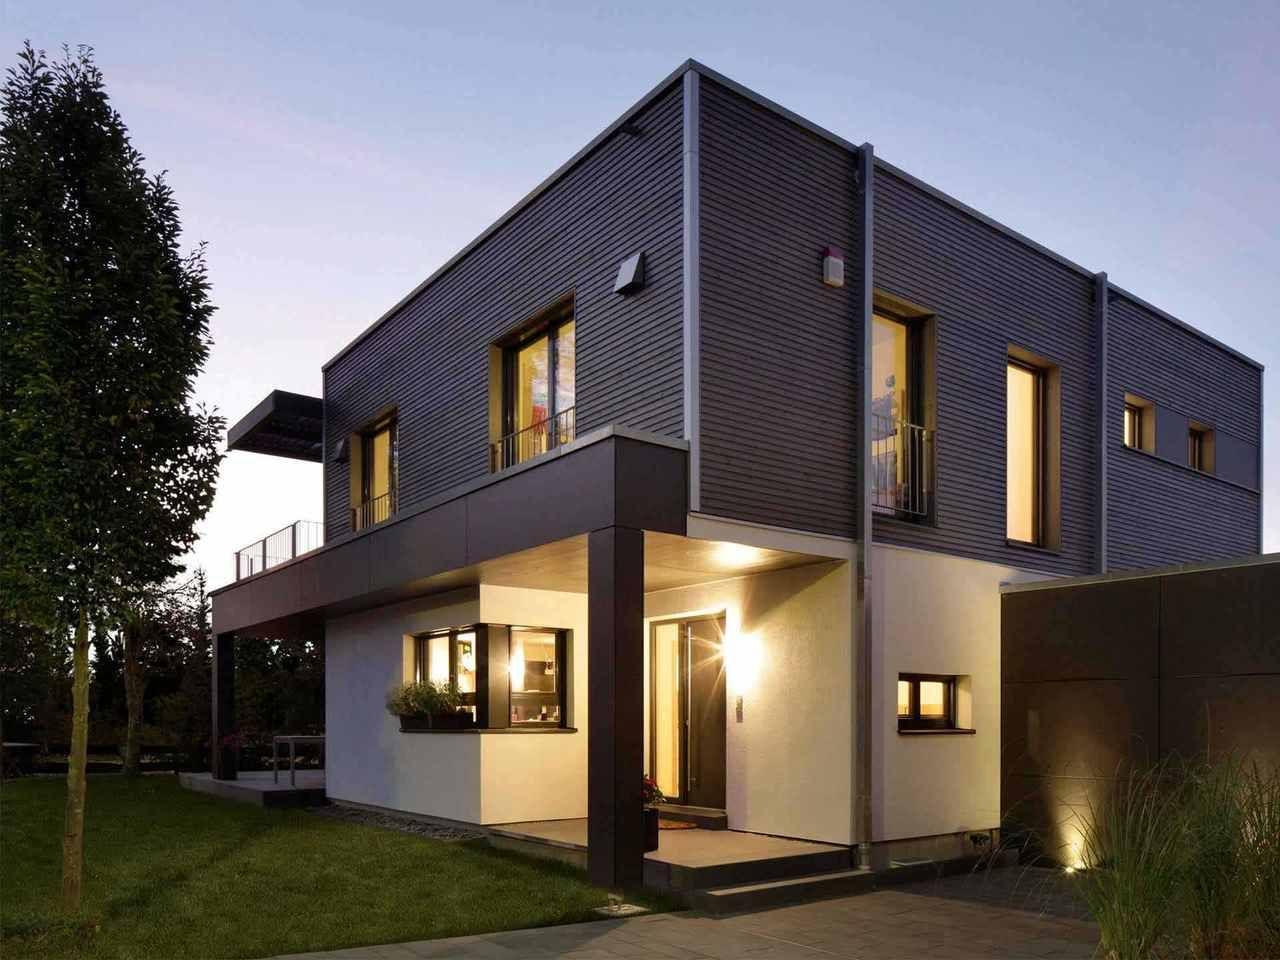 Doppelhaus Nilles Baufritz Baufritz, Moderne